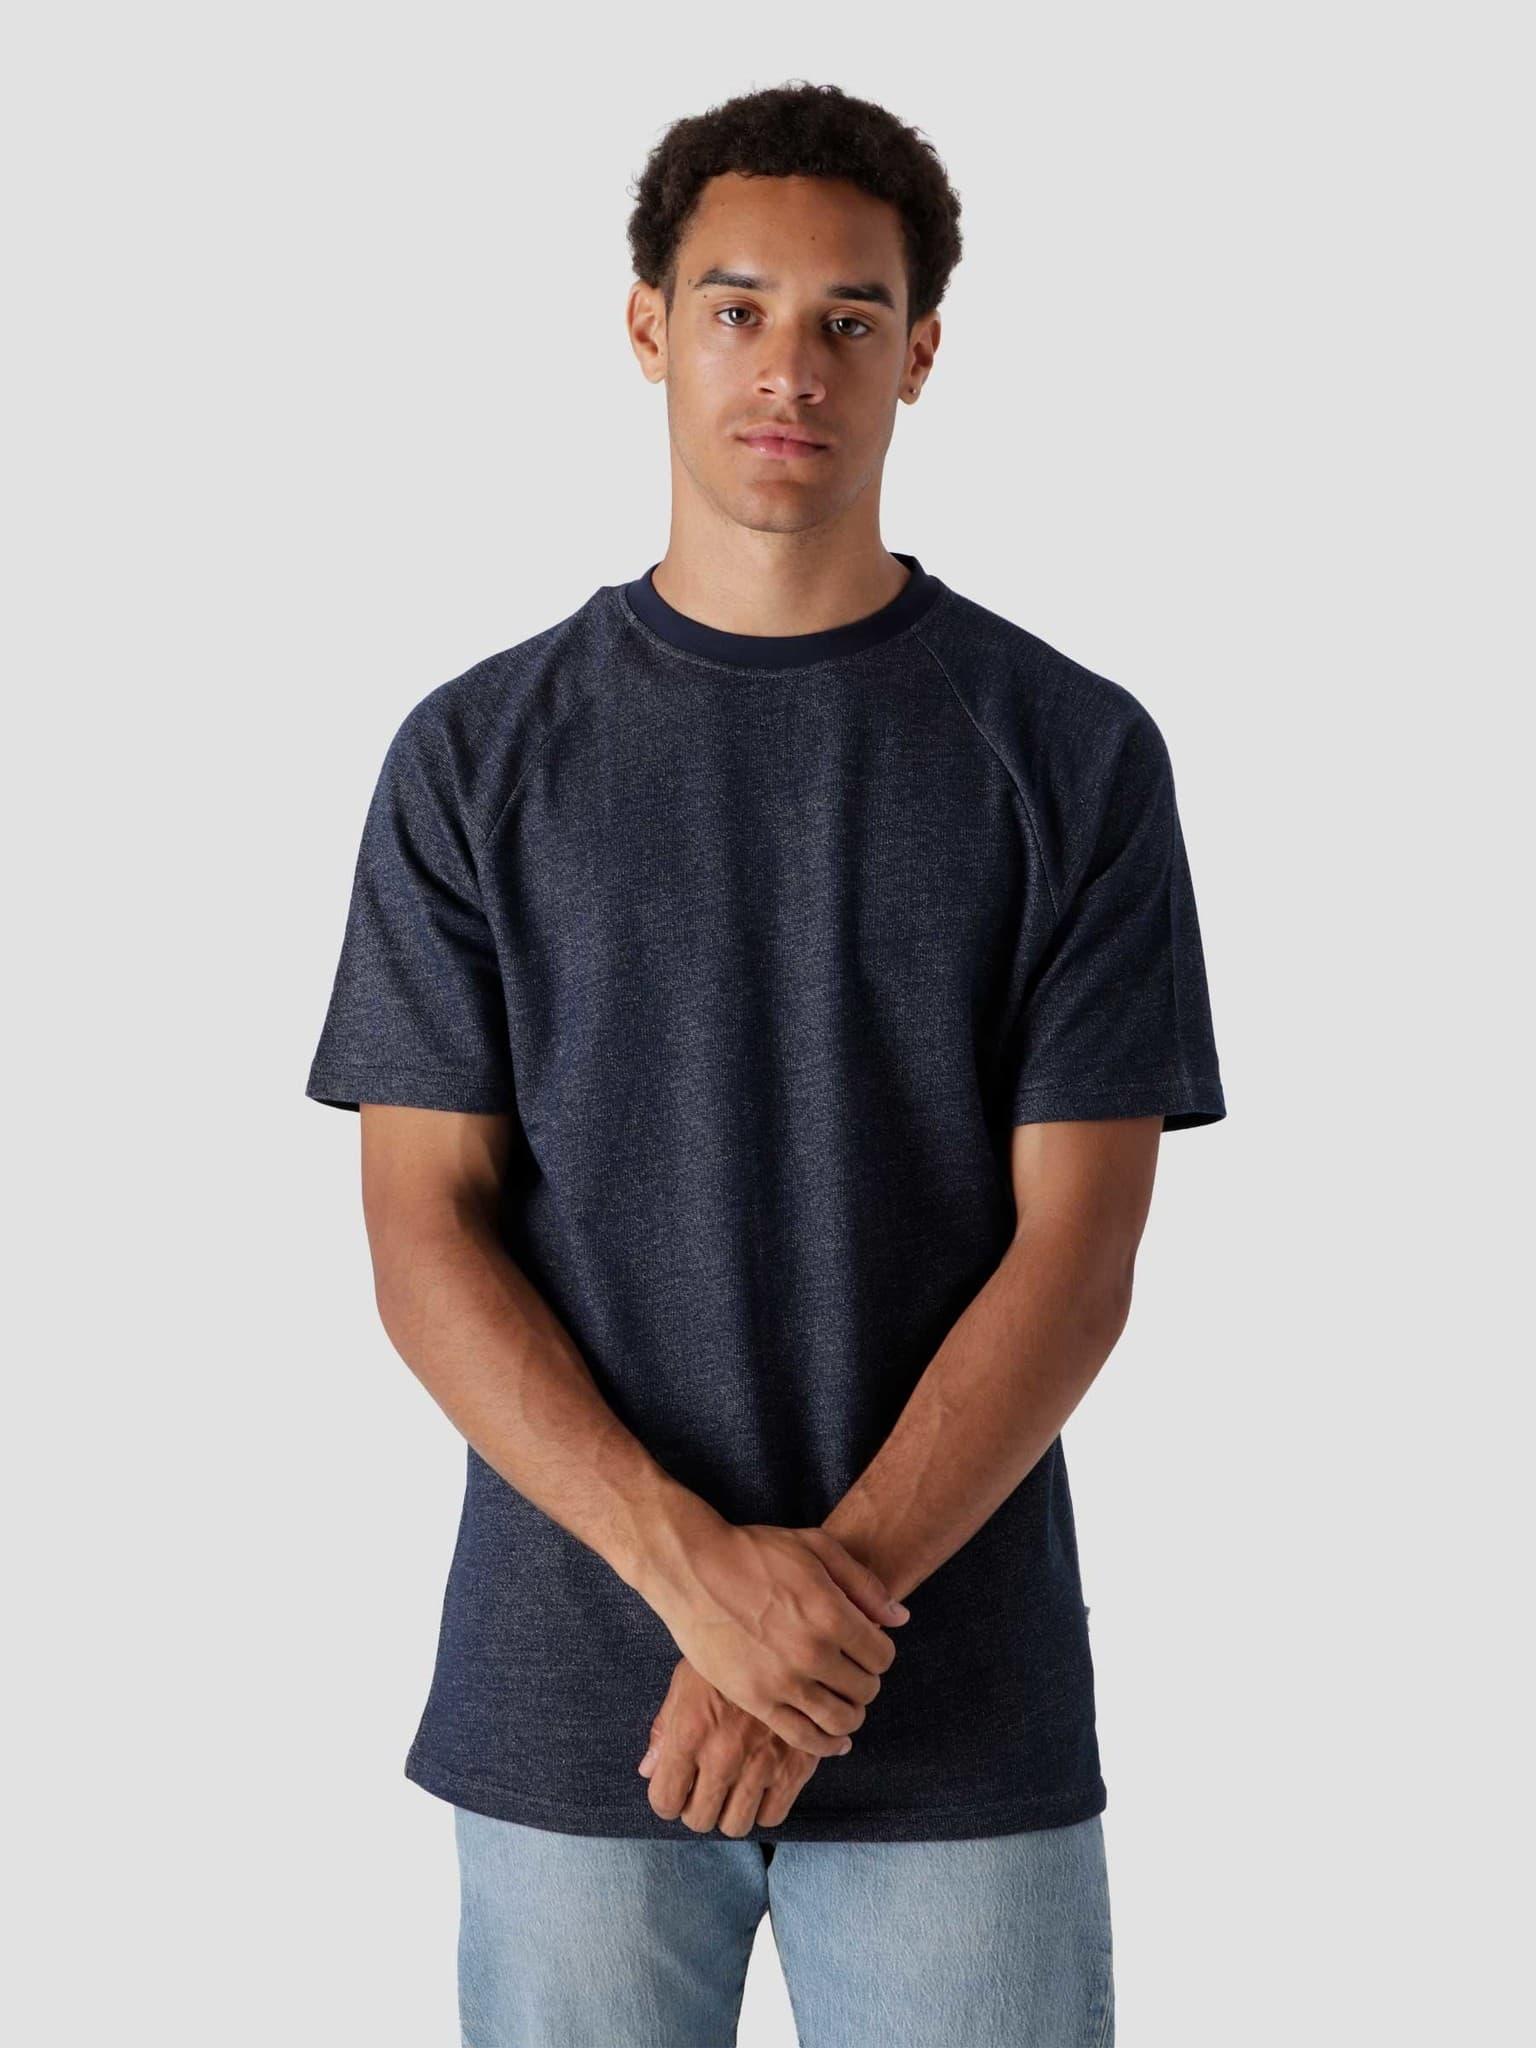 QB303 Denim T-shirt Dark Blue